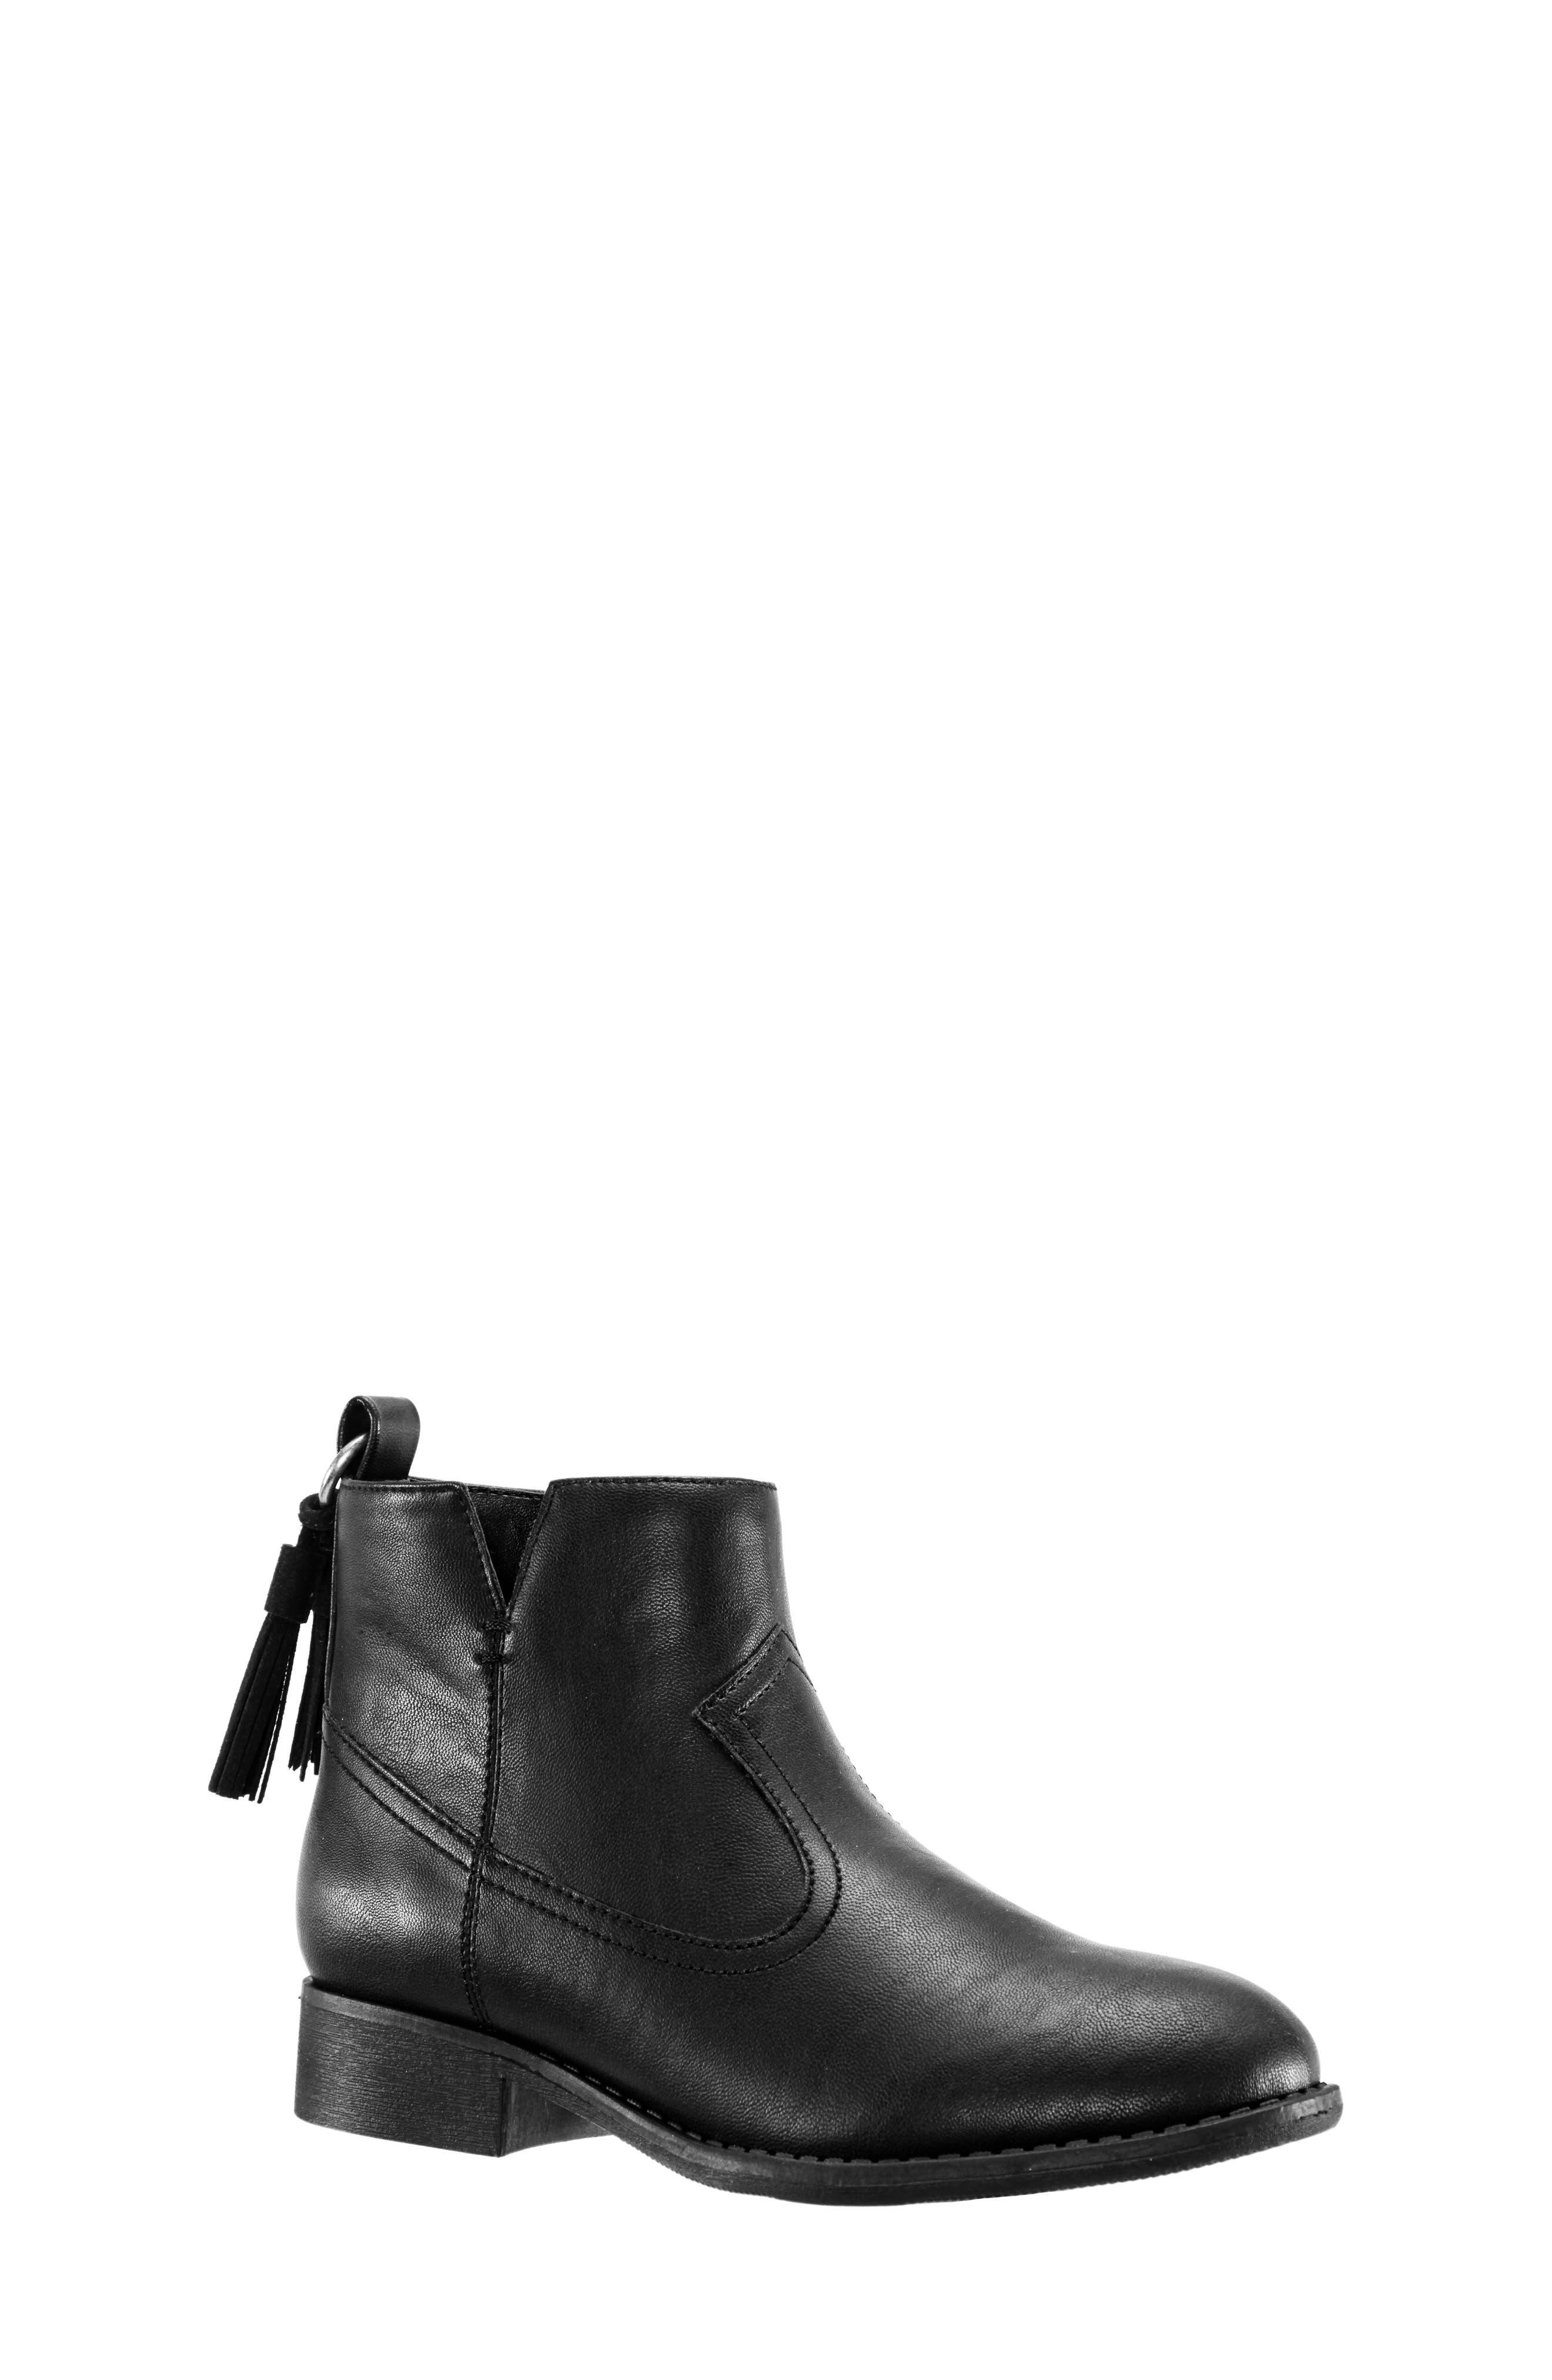 Emerie Block Heel Bootie,                         Main,                         color, BLACK SMOOTH